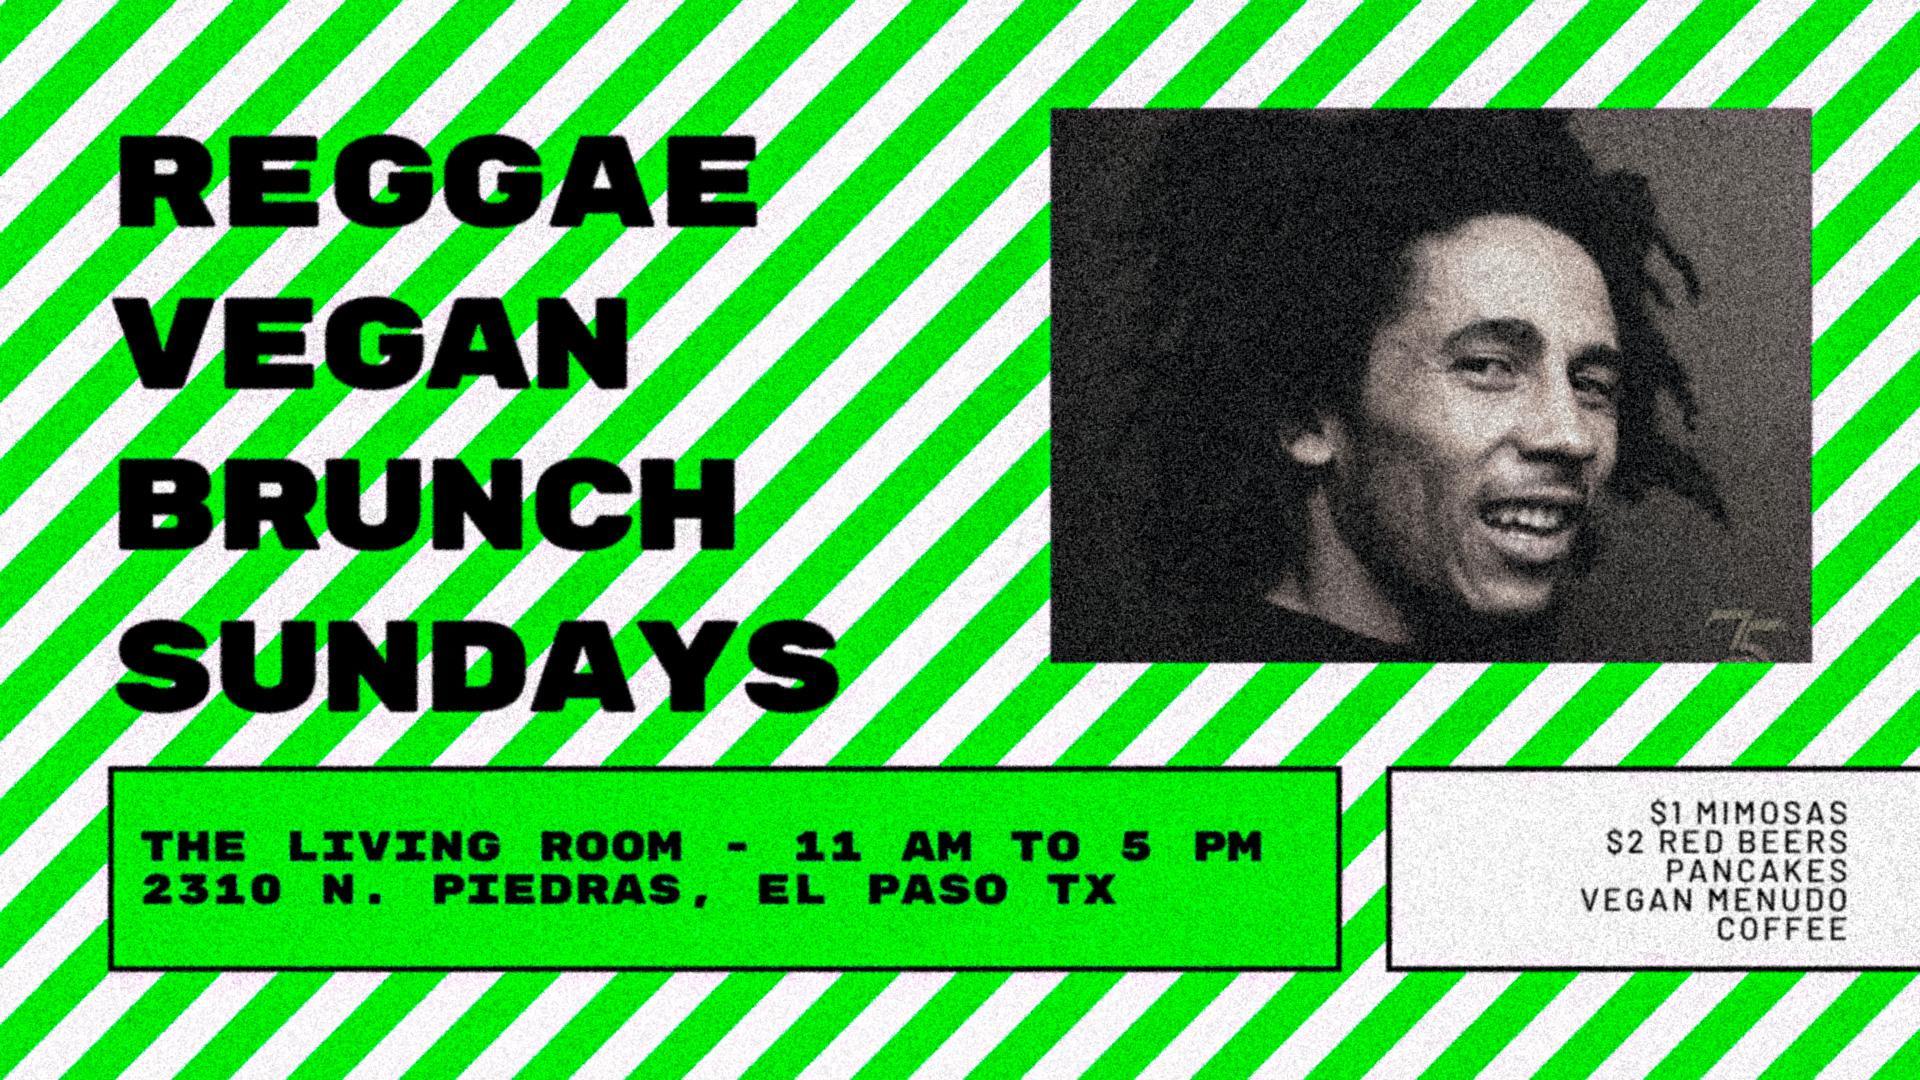 Reggae Vegan Brunch Sundays